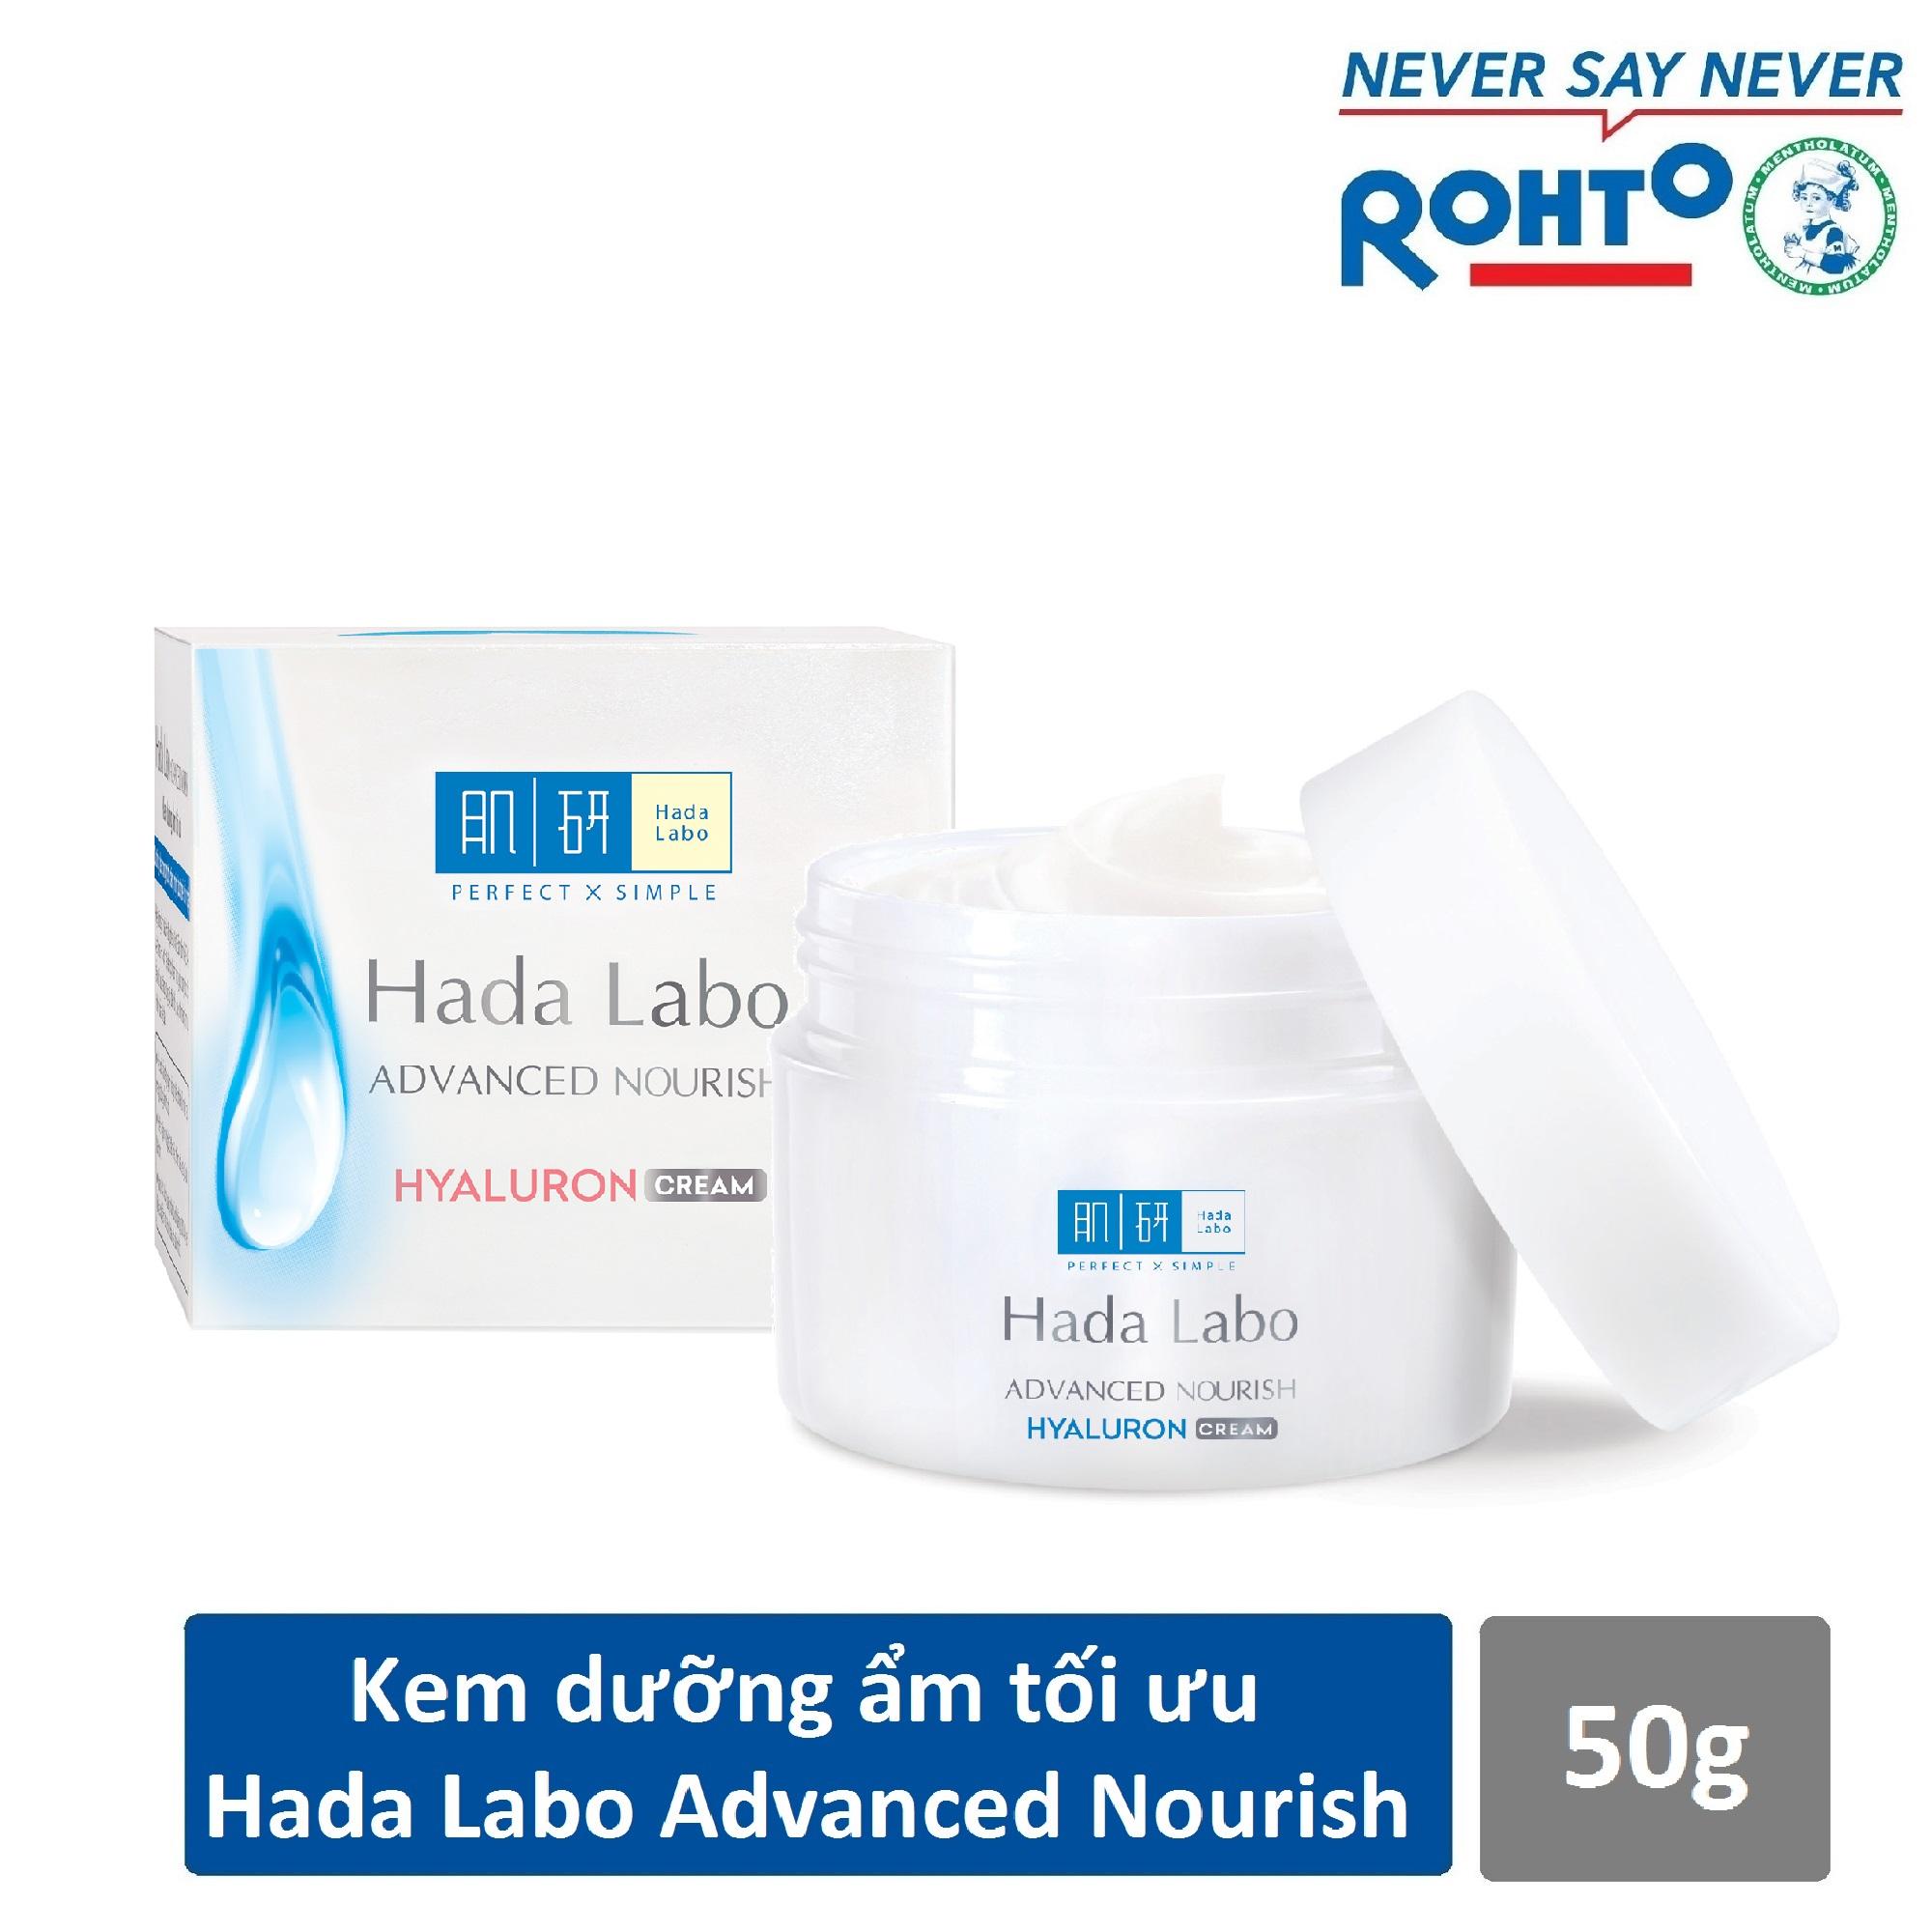 Kem dưỡng ẩm tối ưu Hada Labo Advanced Nourish Cream 50g